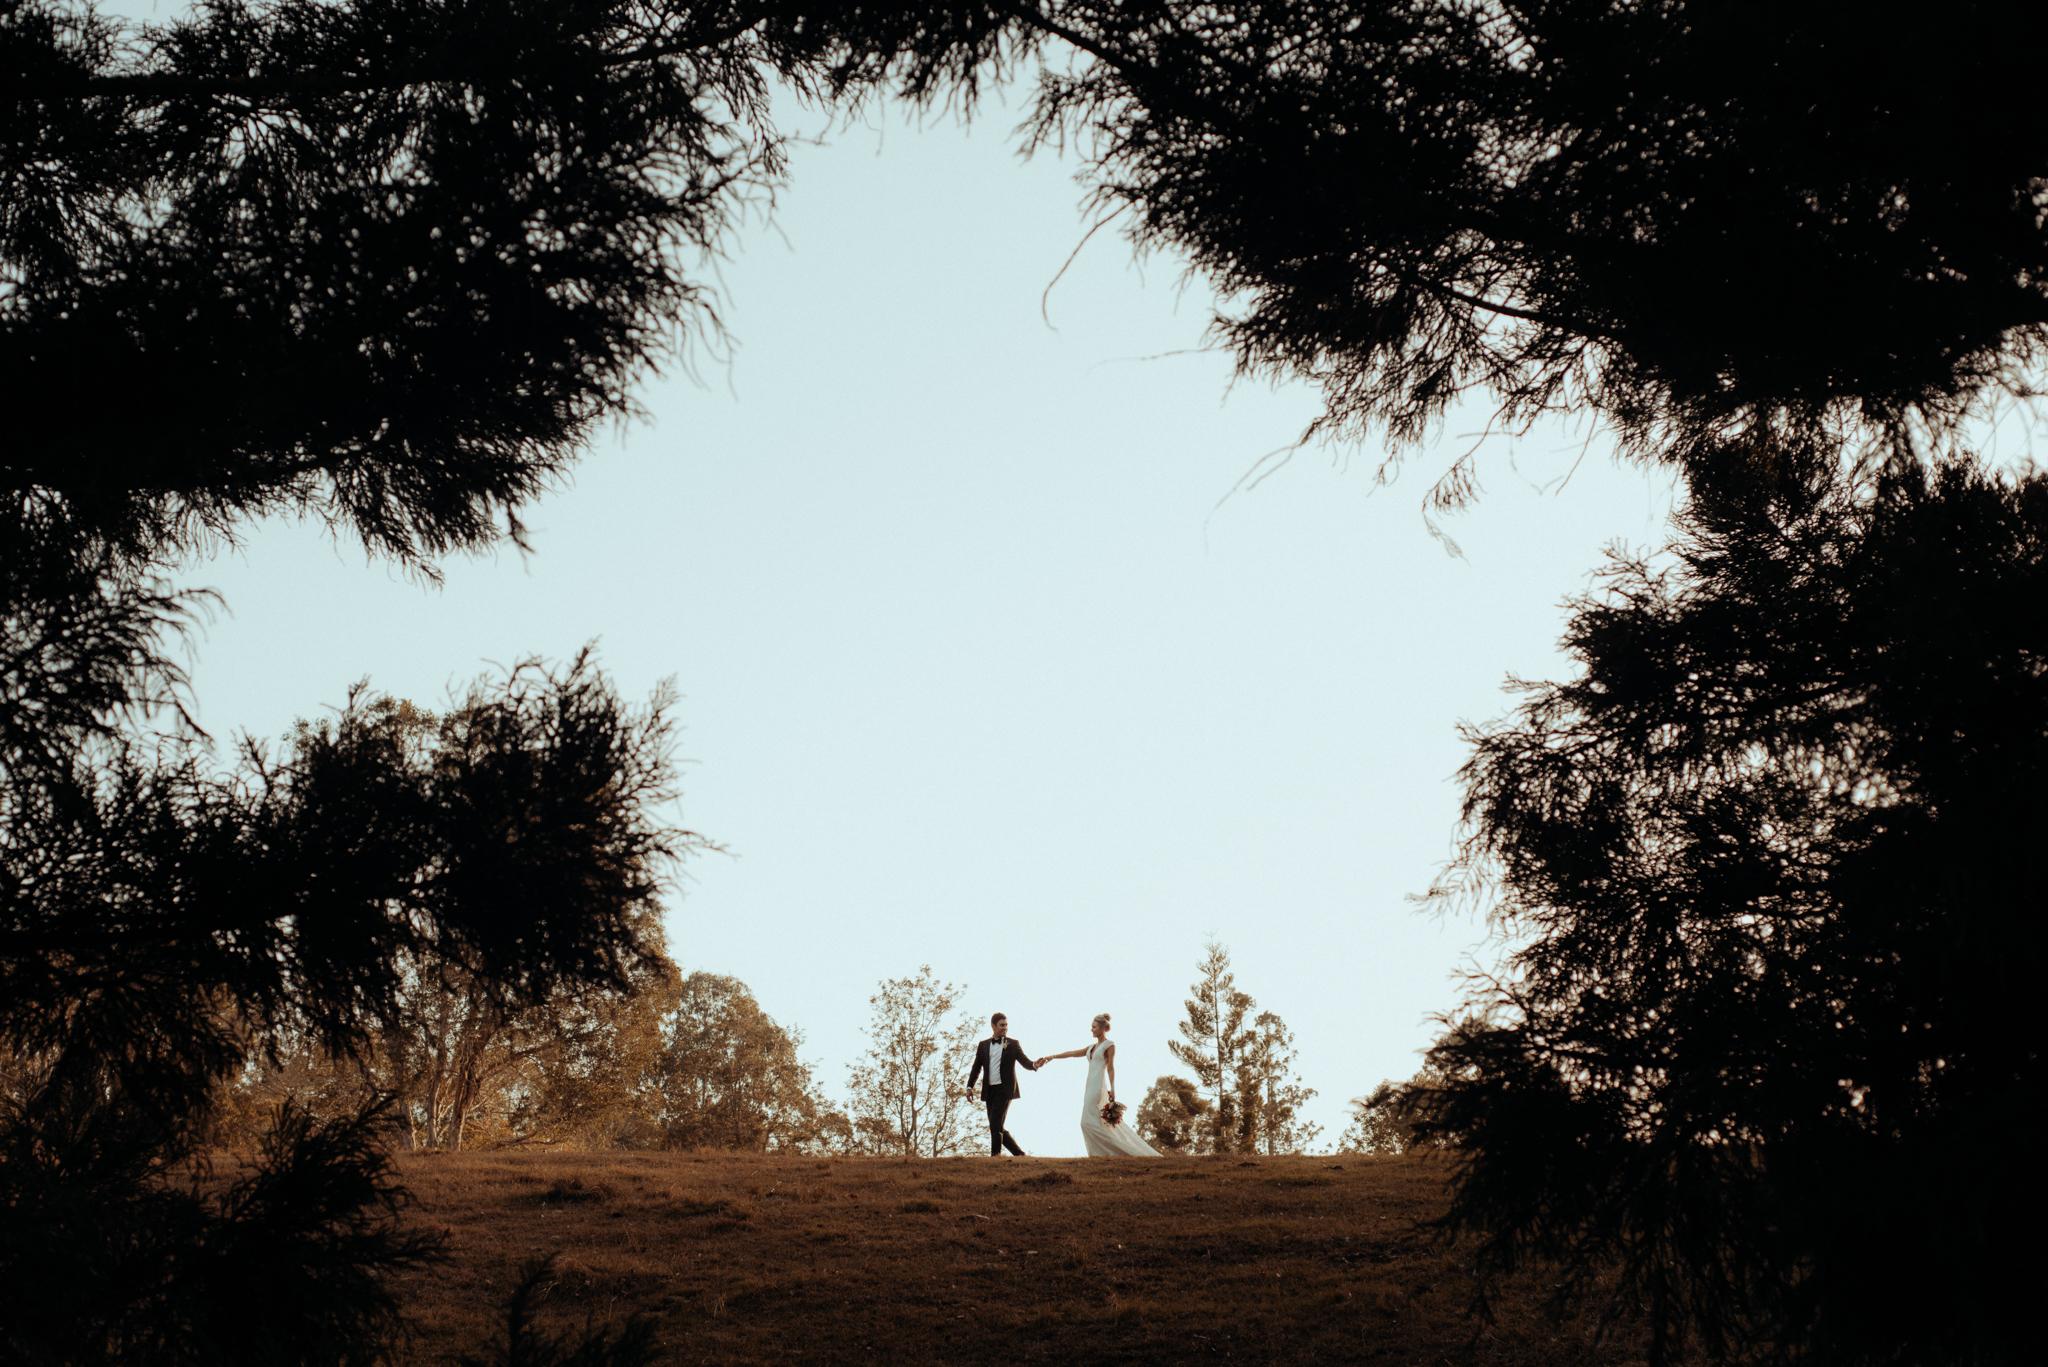 BRISBANE WEDDING PHOTOGRAPHER • BUNDALEER RAINFOREST GARDENS WEDDING • ONE DAY BRIDAL WEDDING GOWN • ROXY HOTTEN CELEBRANT • LOVELENSCAPES PHOTOGRAPHY • 115.jpg